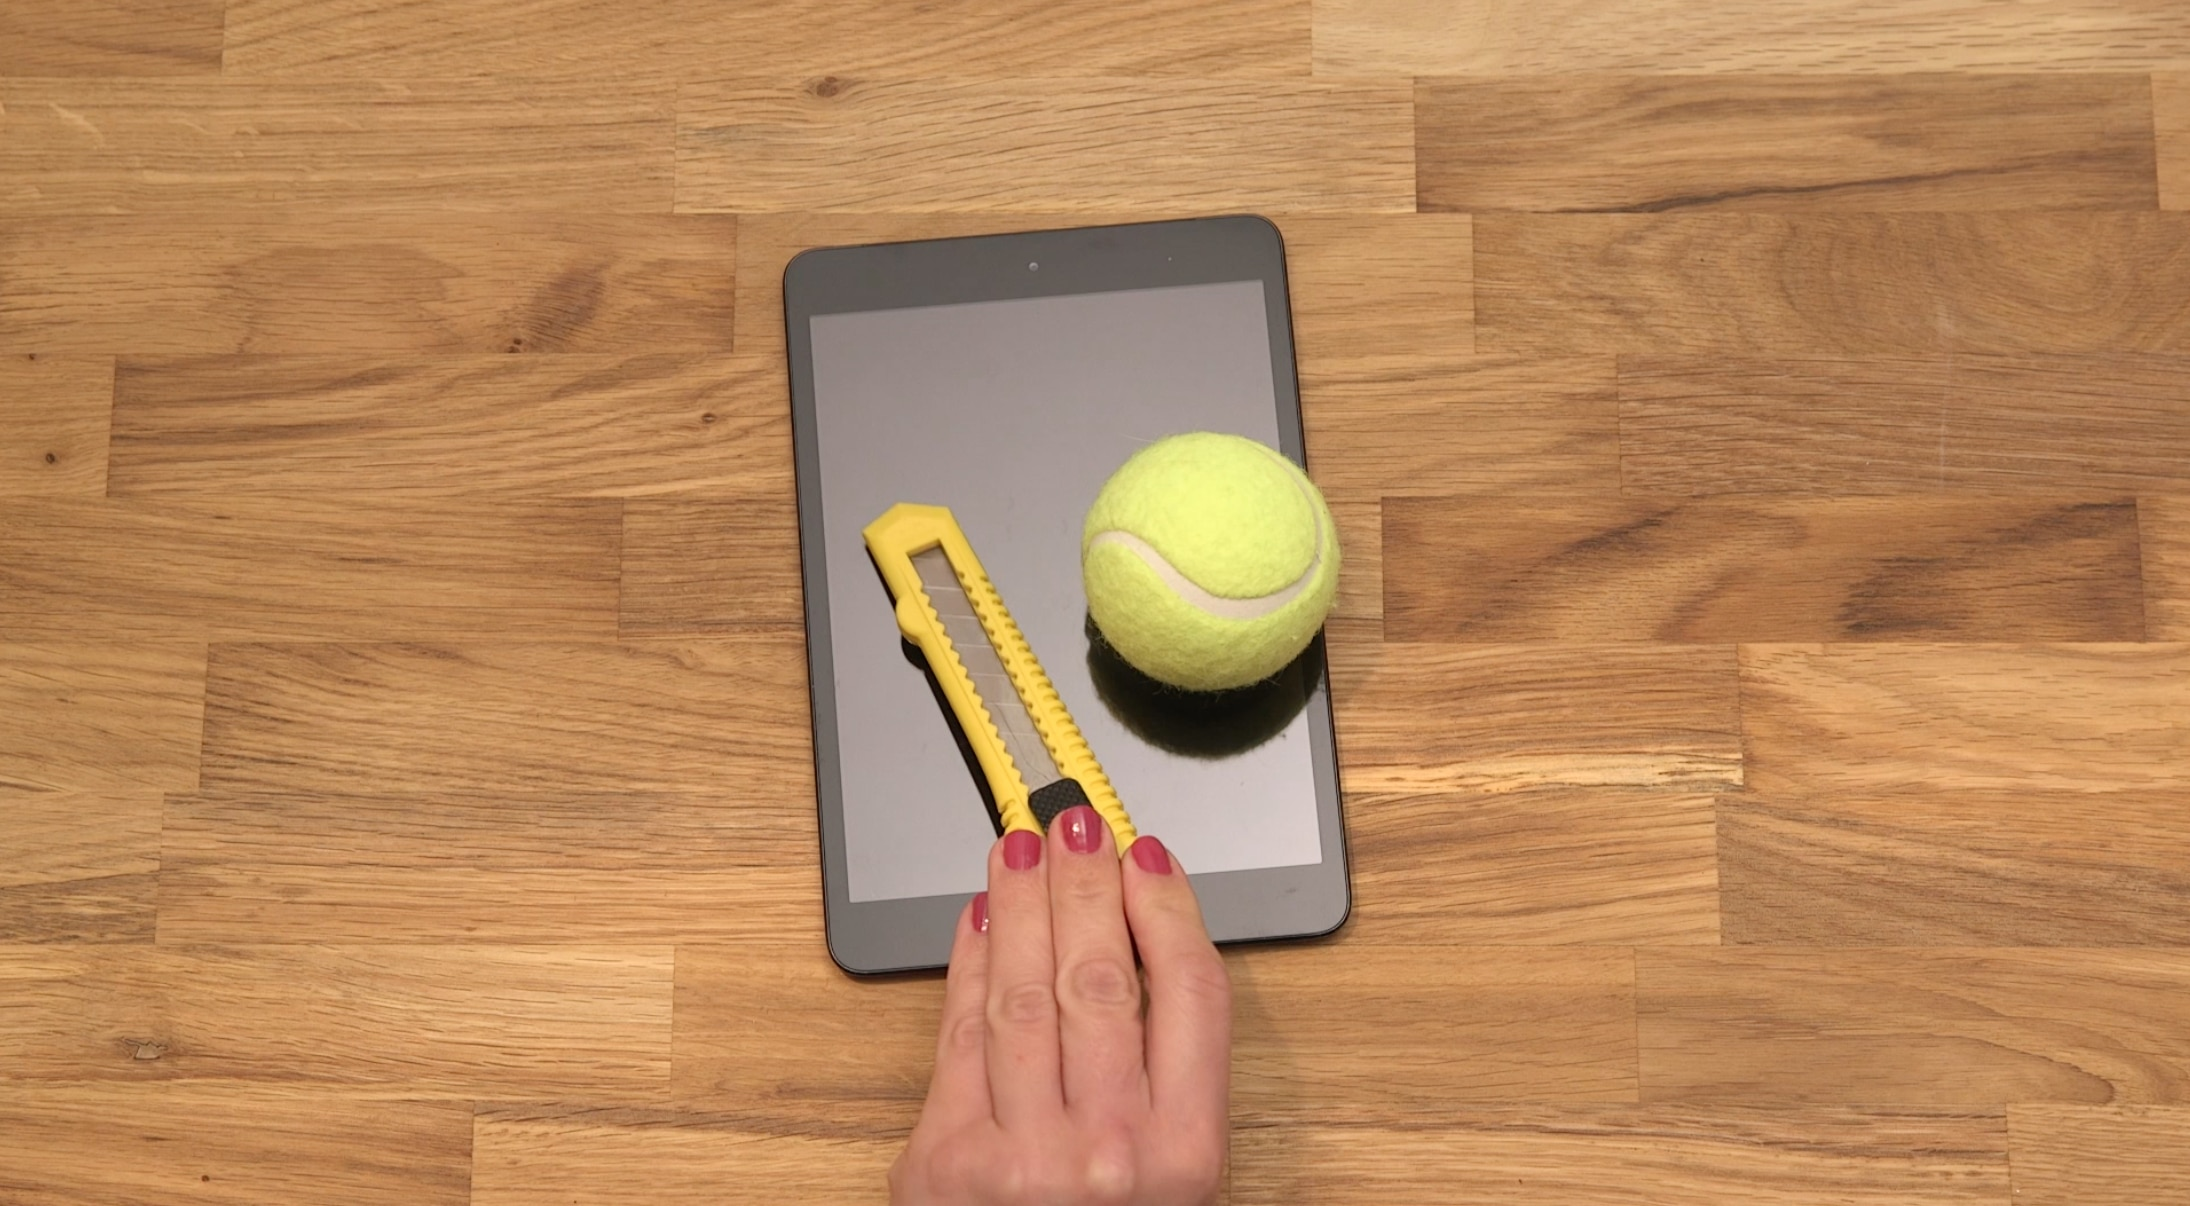 tablet lautsprecher aus tennisball selbst basteln techbook. Black Bedroom Furniture Sets. Home Design Ideas